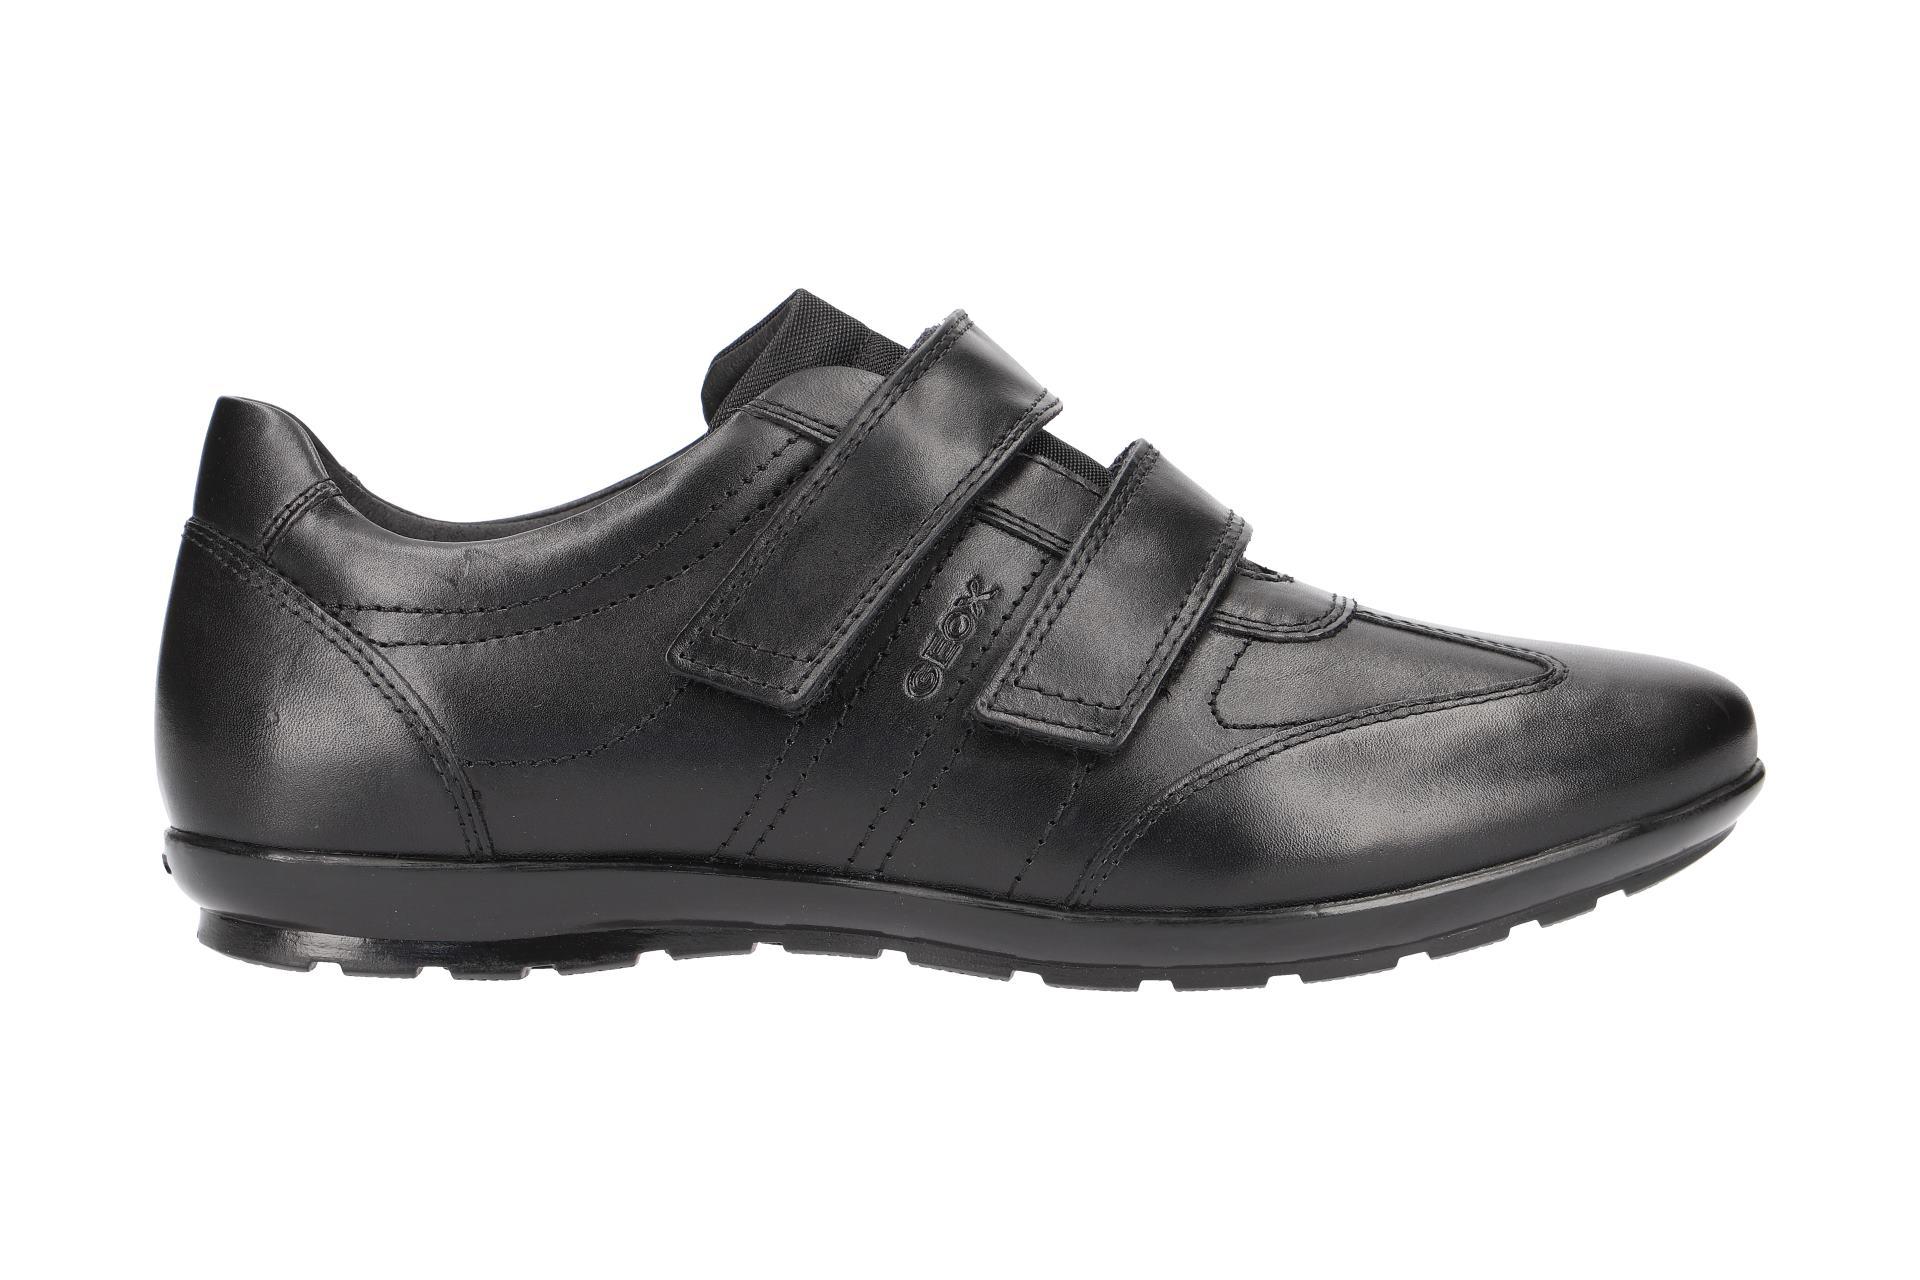 Geox Schuhe SYMBOL schwarz Herrenschuhe elegante Slipper U74A5D 00043 C9999 NEU